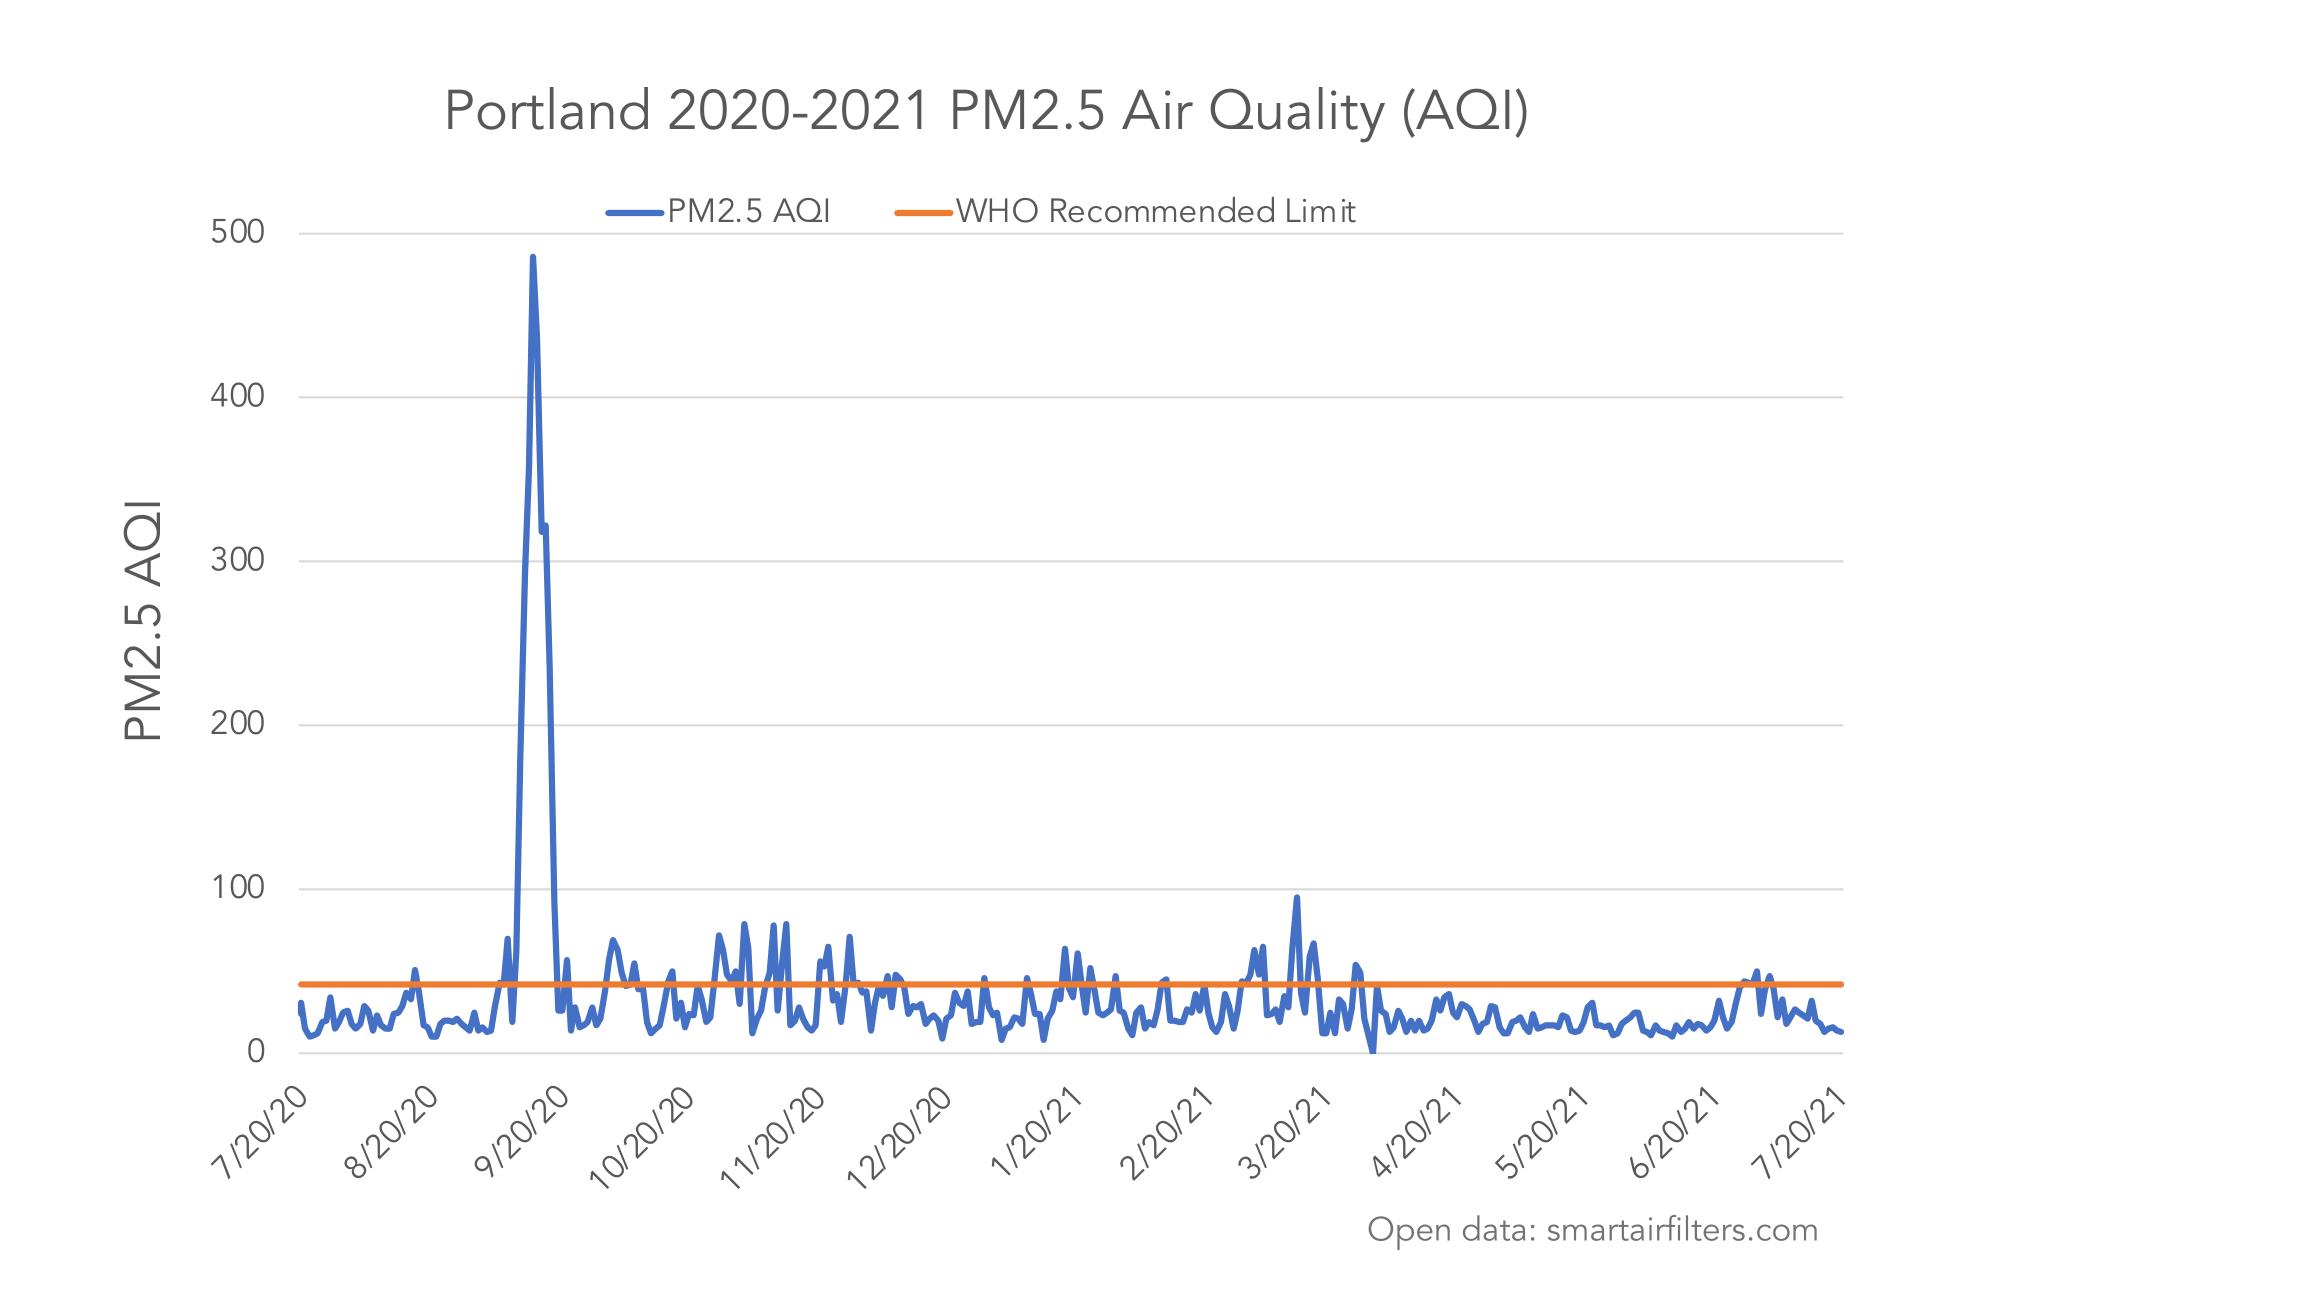 Portland PM2.5 Air Quality